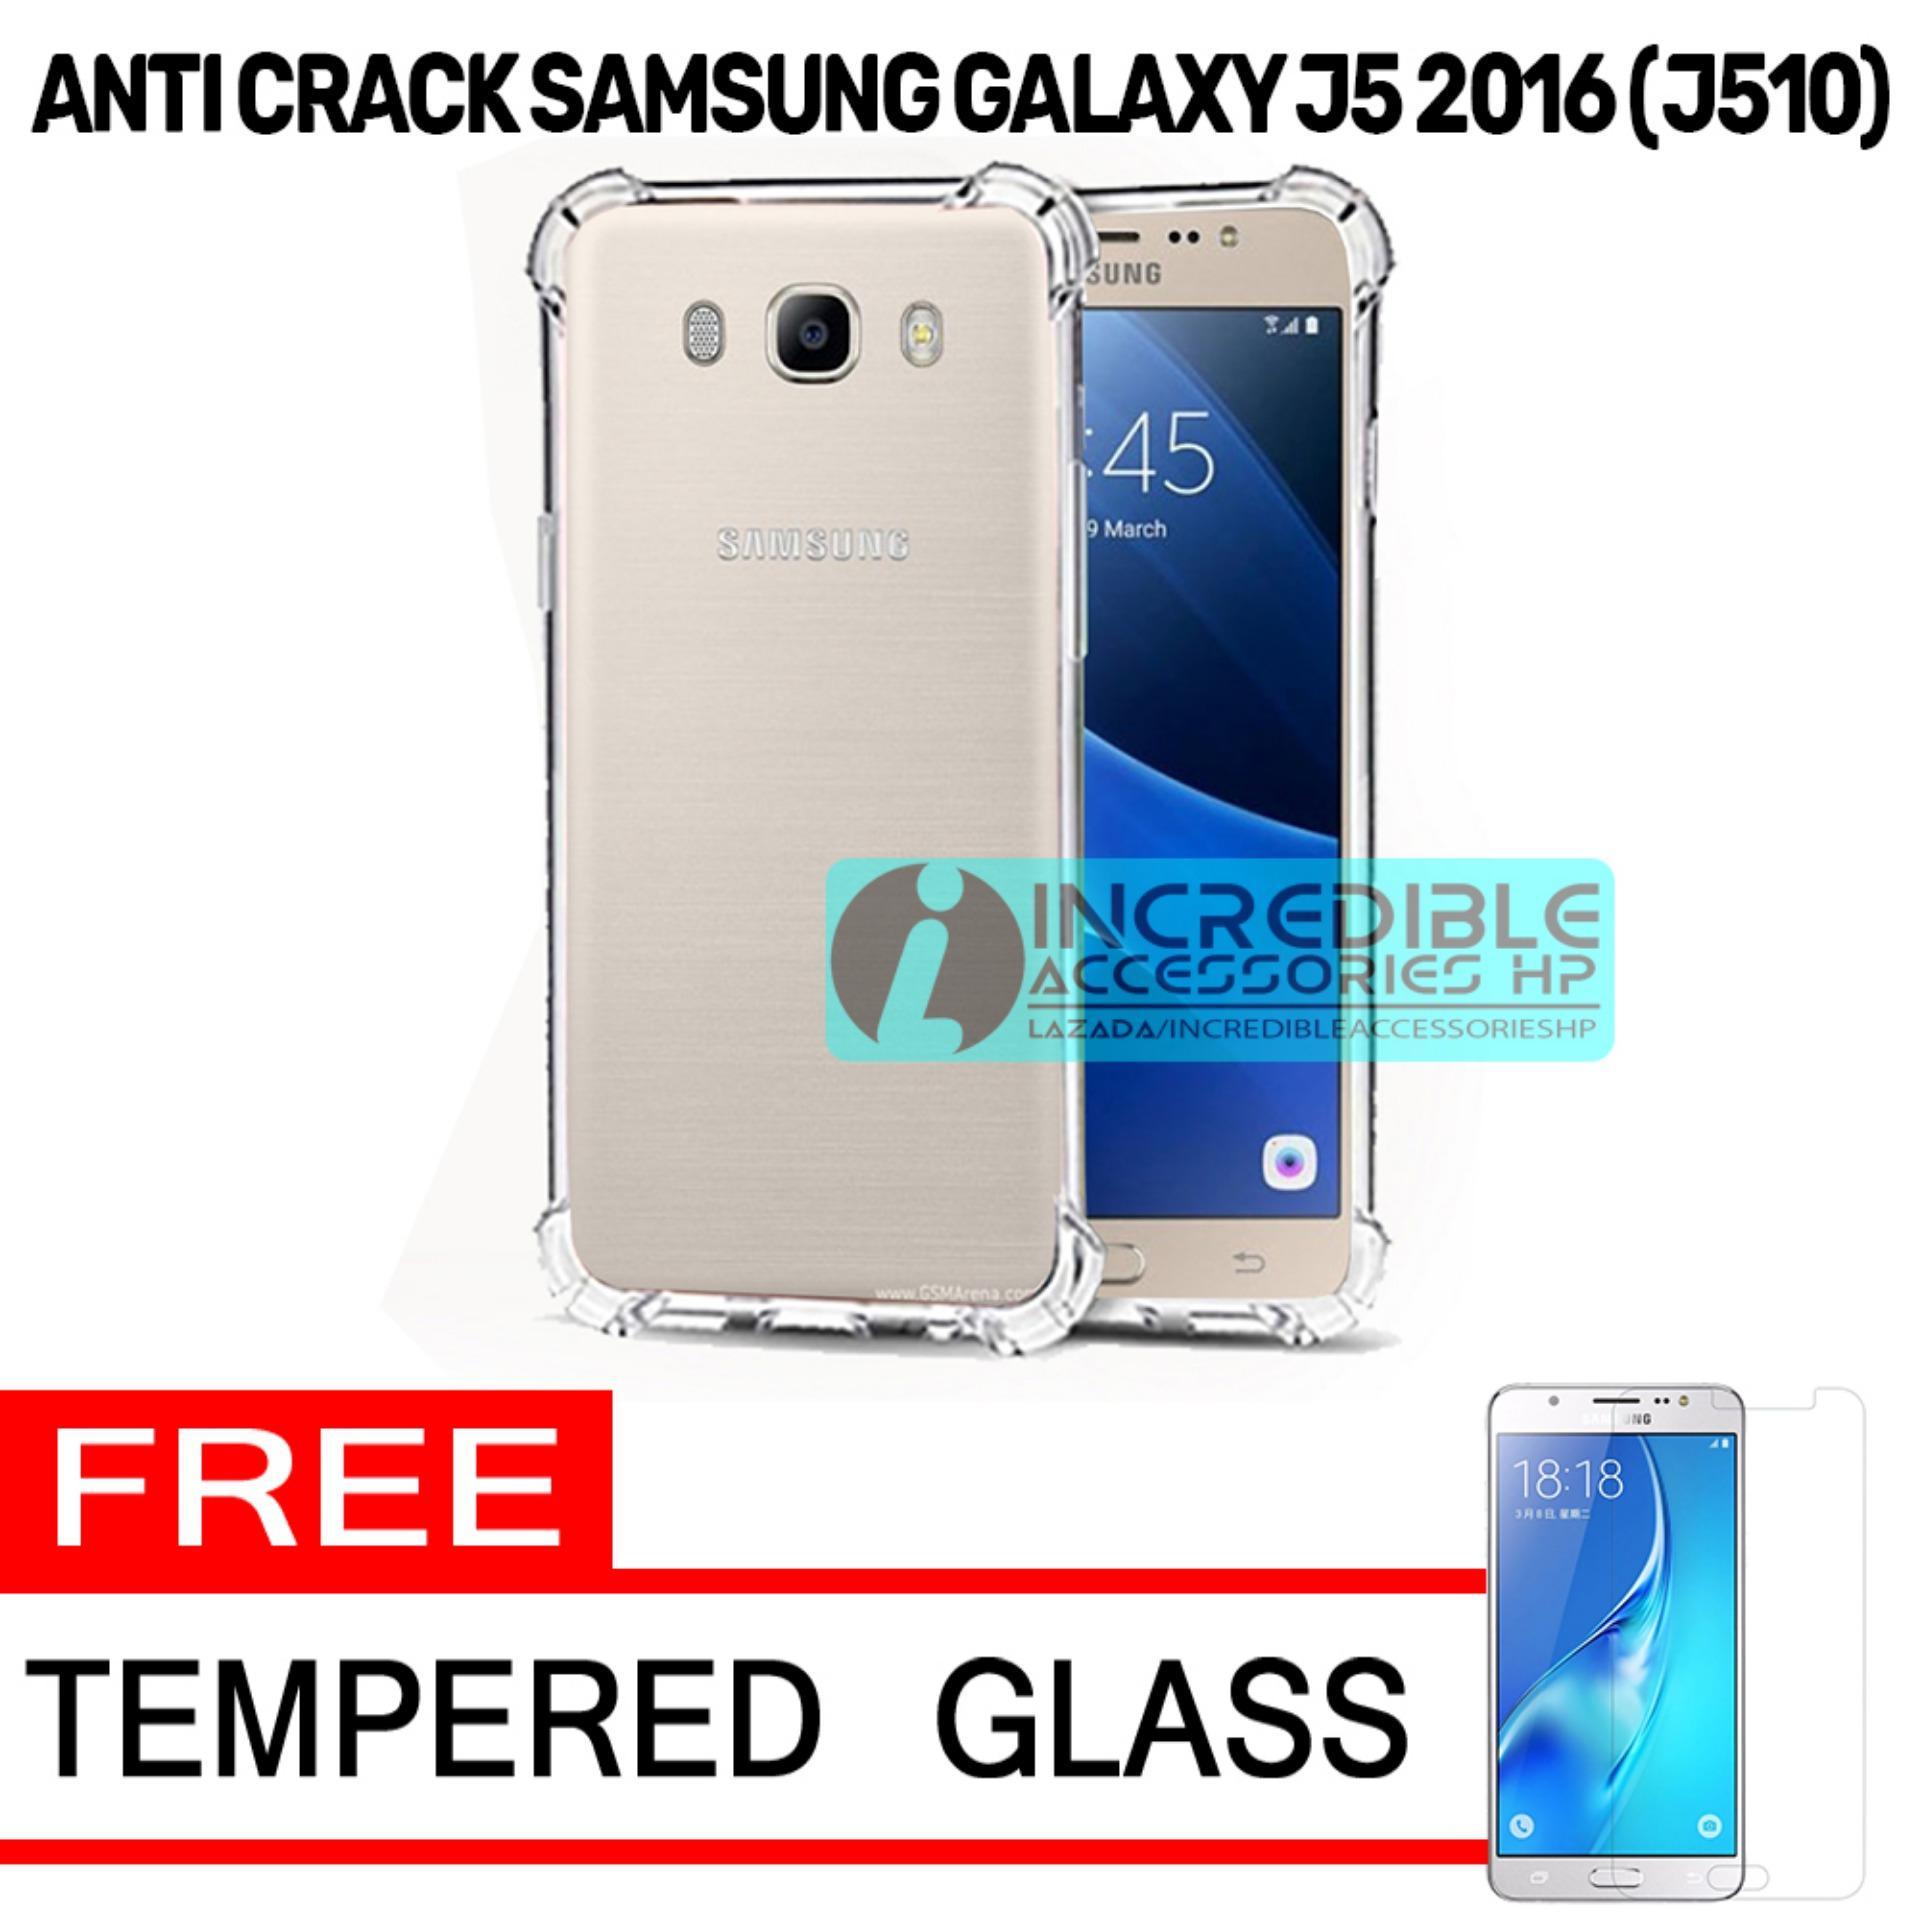 Harga Case Tough Armor Rugged Capsule Tpu . Source · Case Anti Shock / Anti Crack Elegant Softcase for Samsung Galaxy J5 2016 (J510)